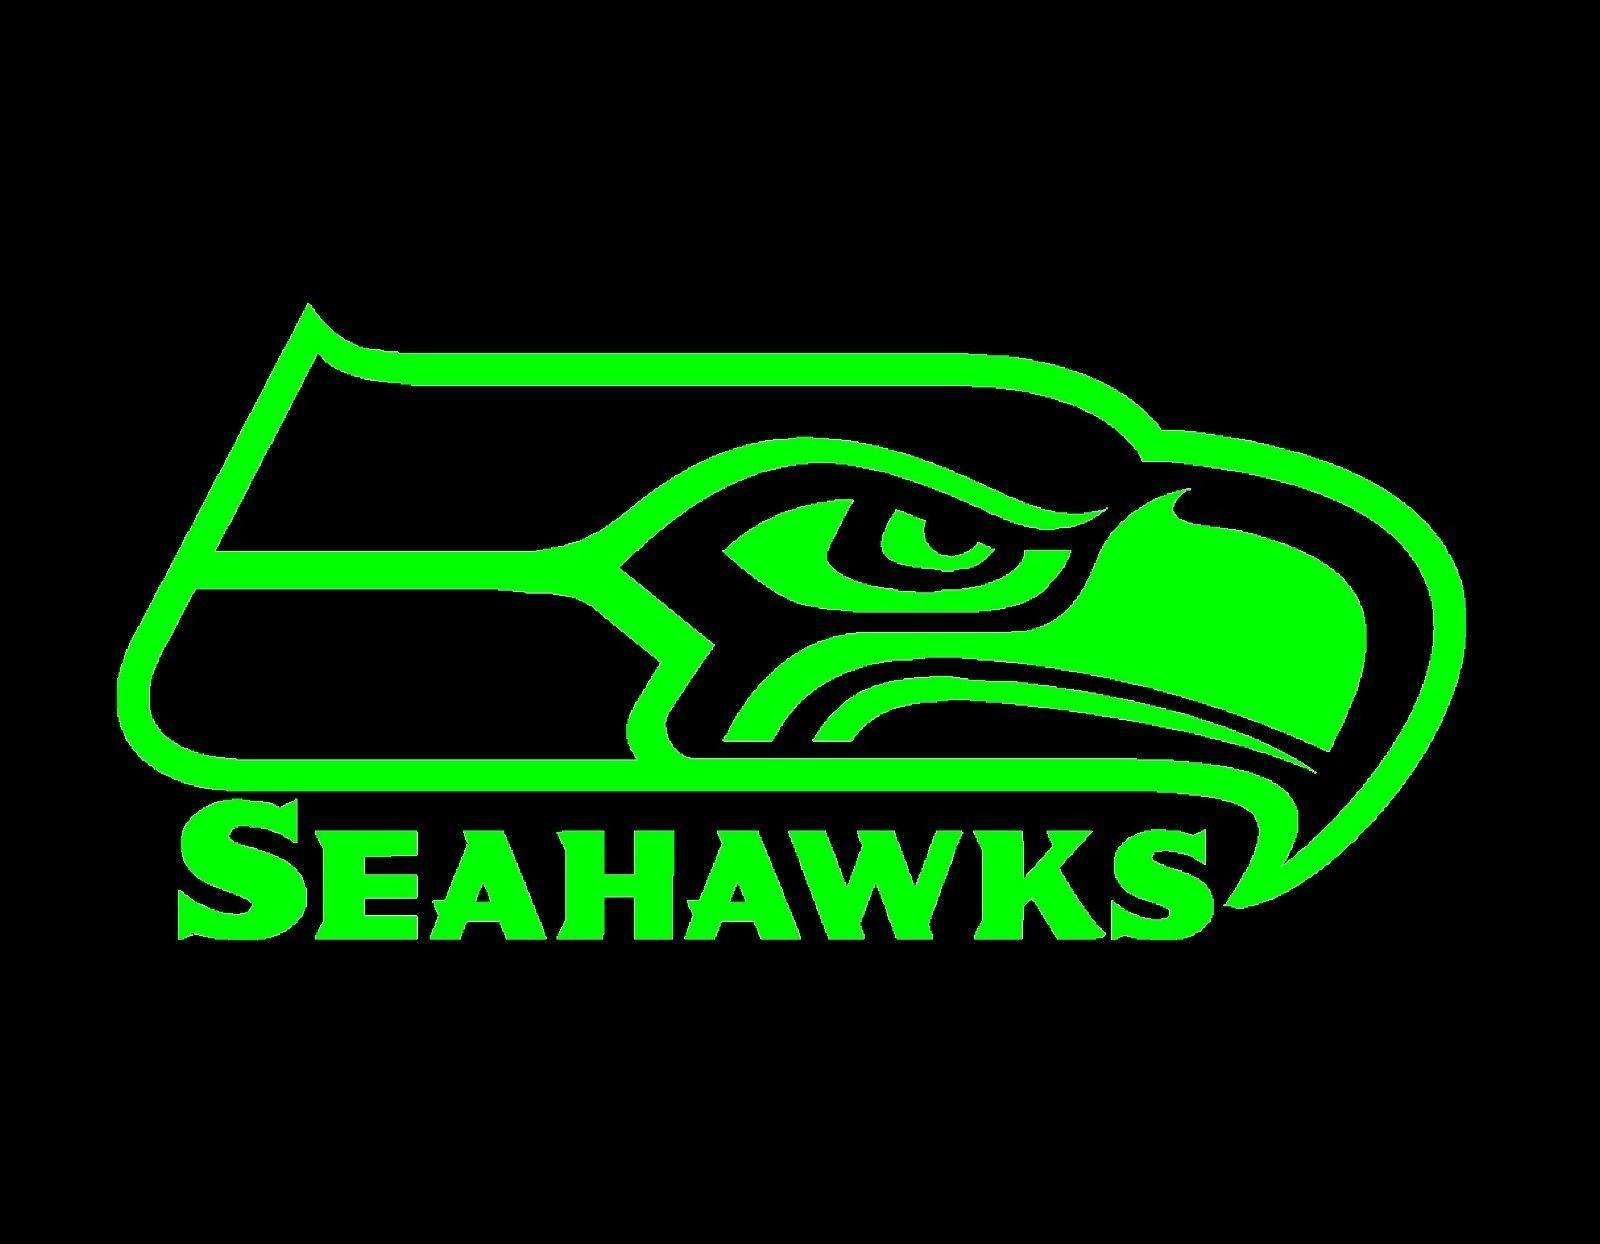 "5.99 Seahawks Vinyl Decal Neon Green 4.25"" X 9"" Seahawk"